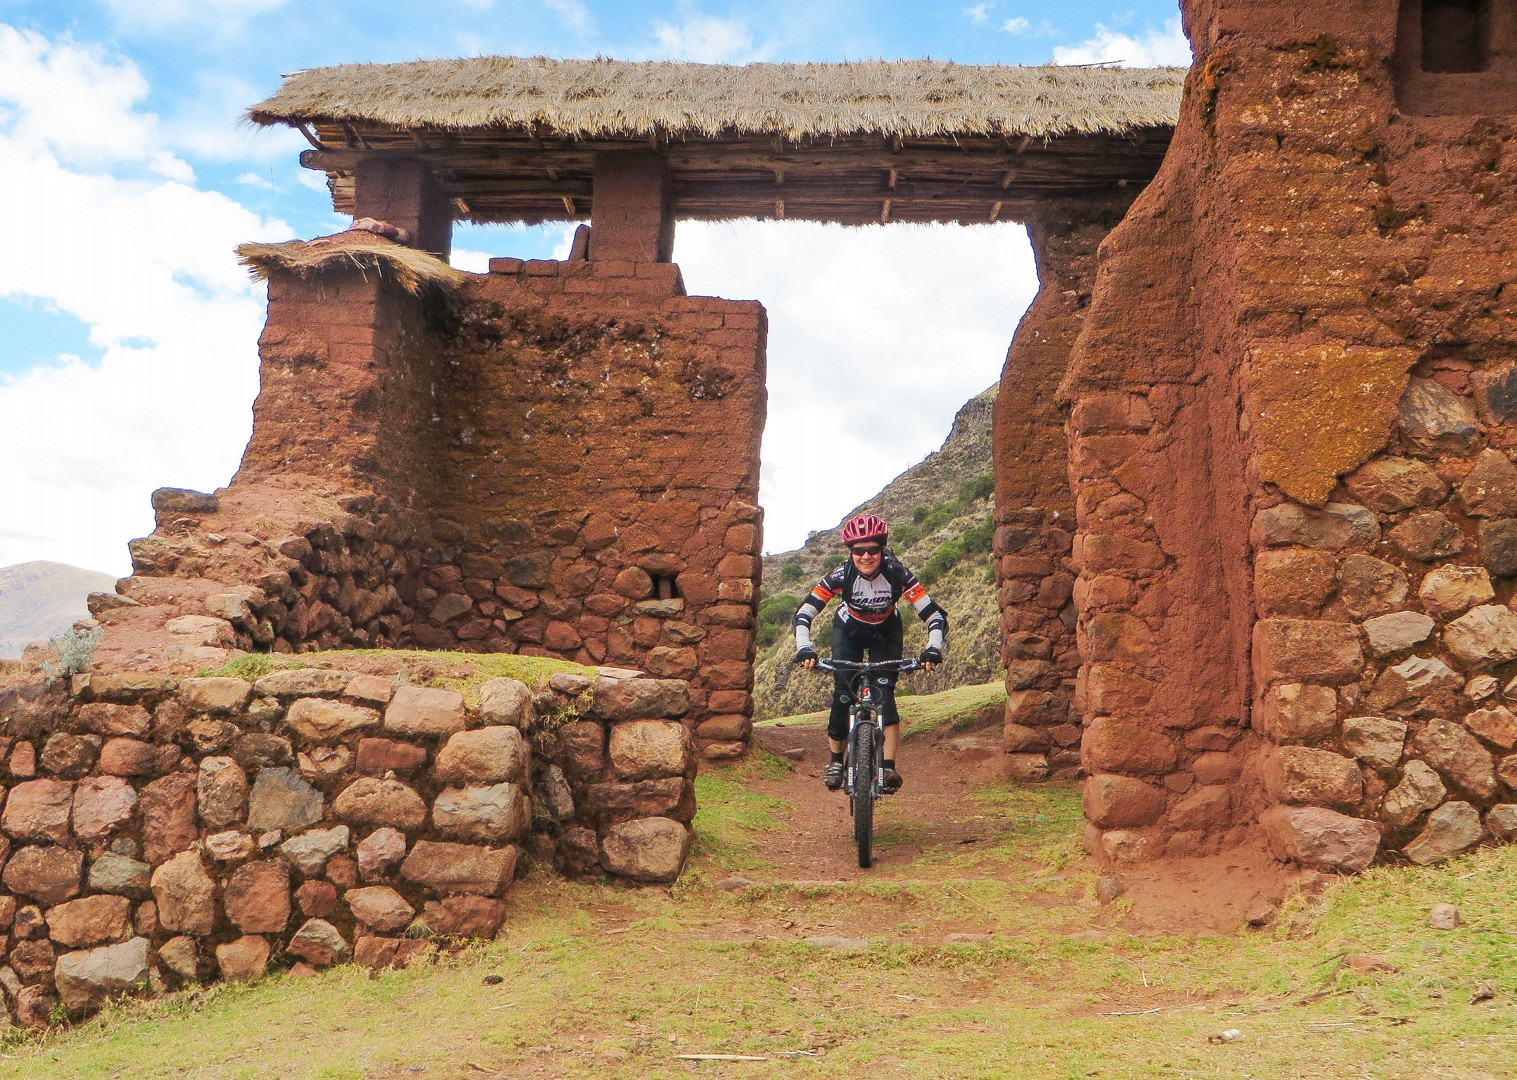 IMG_2245.jpg - Peru - Andean Journey - Guided Mountain Bike Holiday - Mountain Biking